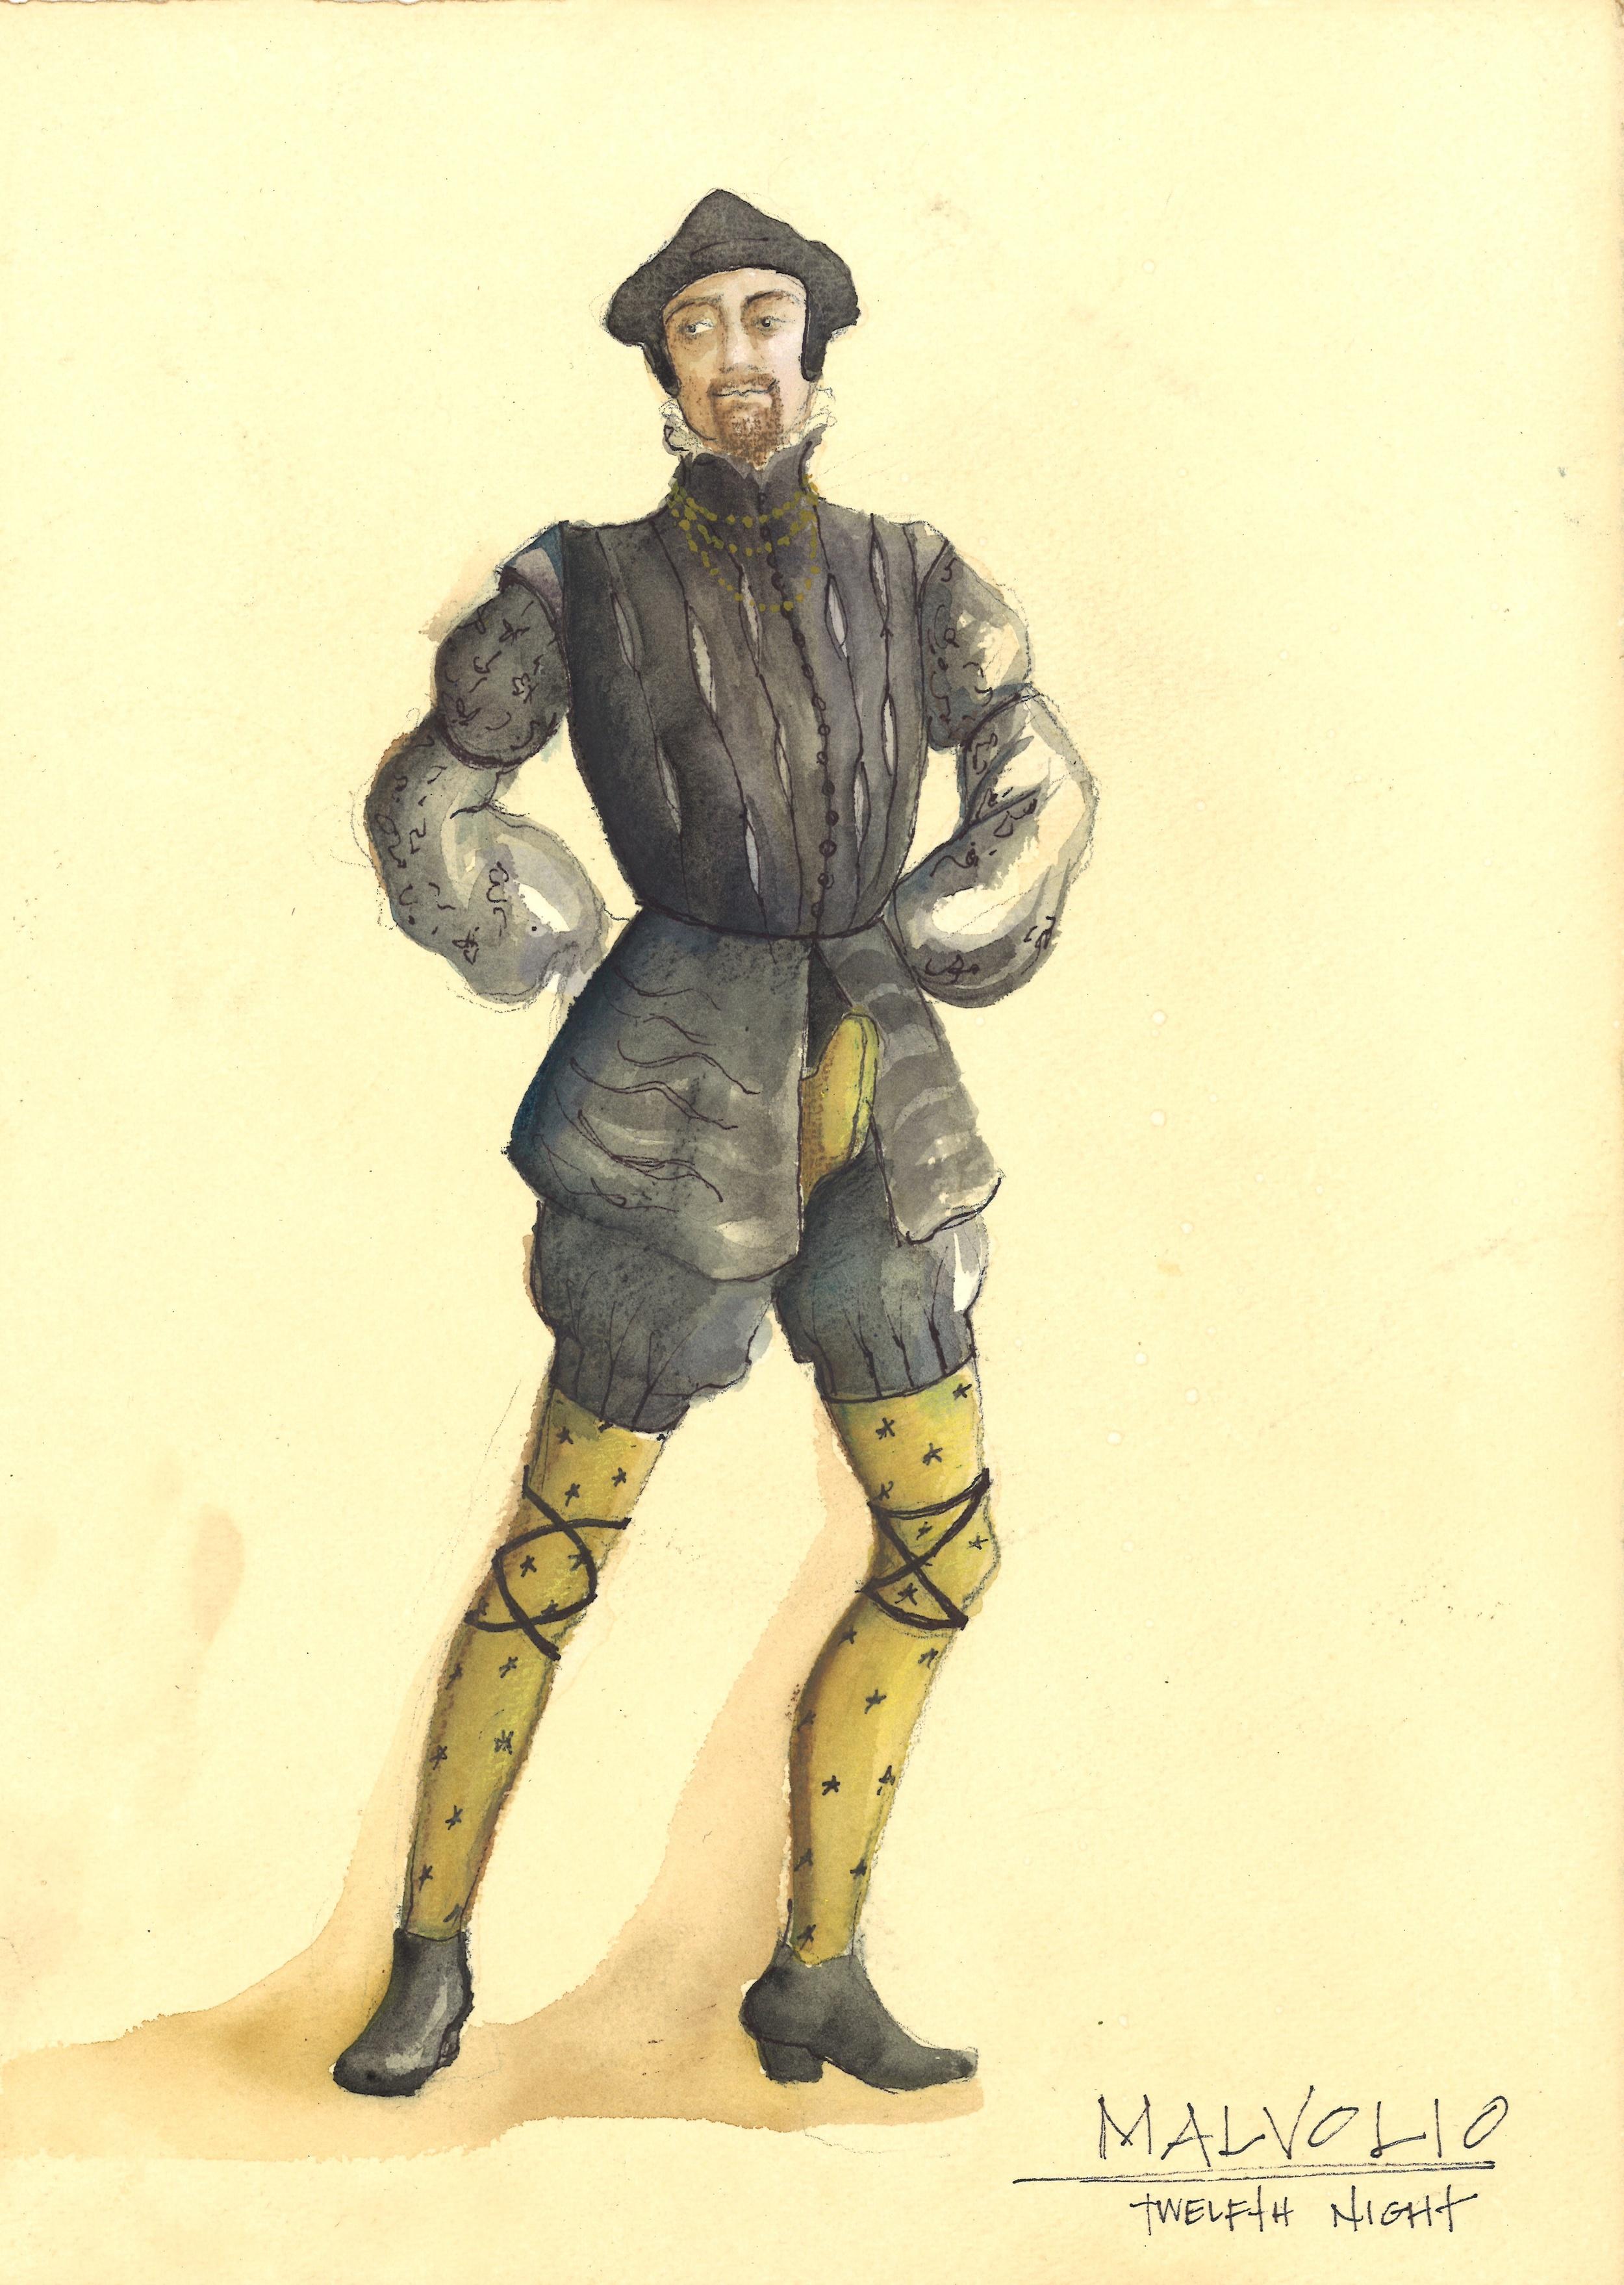 Malvolio's Yellow Stockings